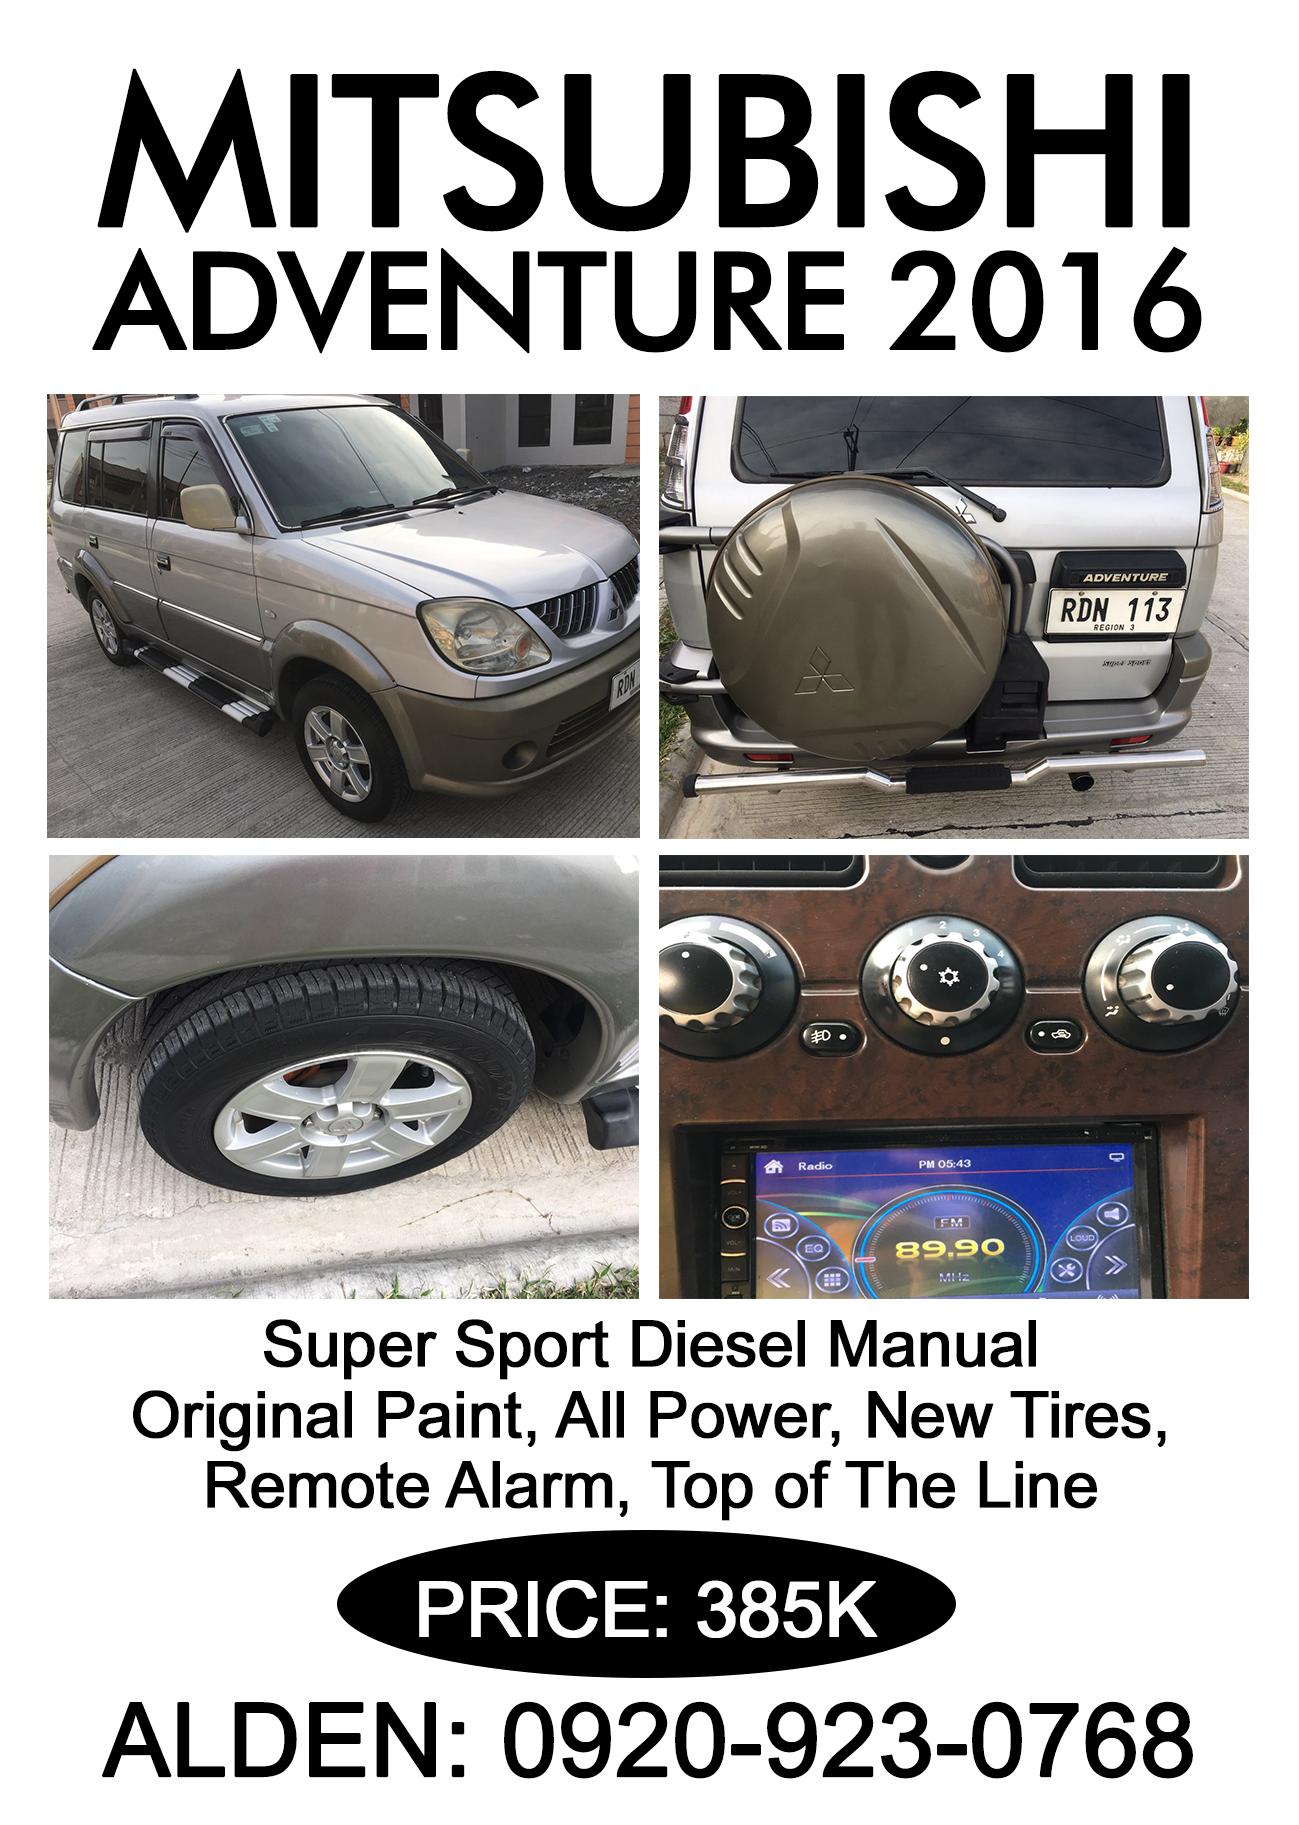 Mitsubishi Adventures 2016